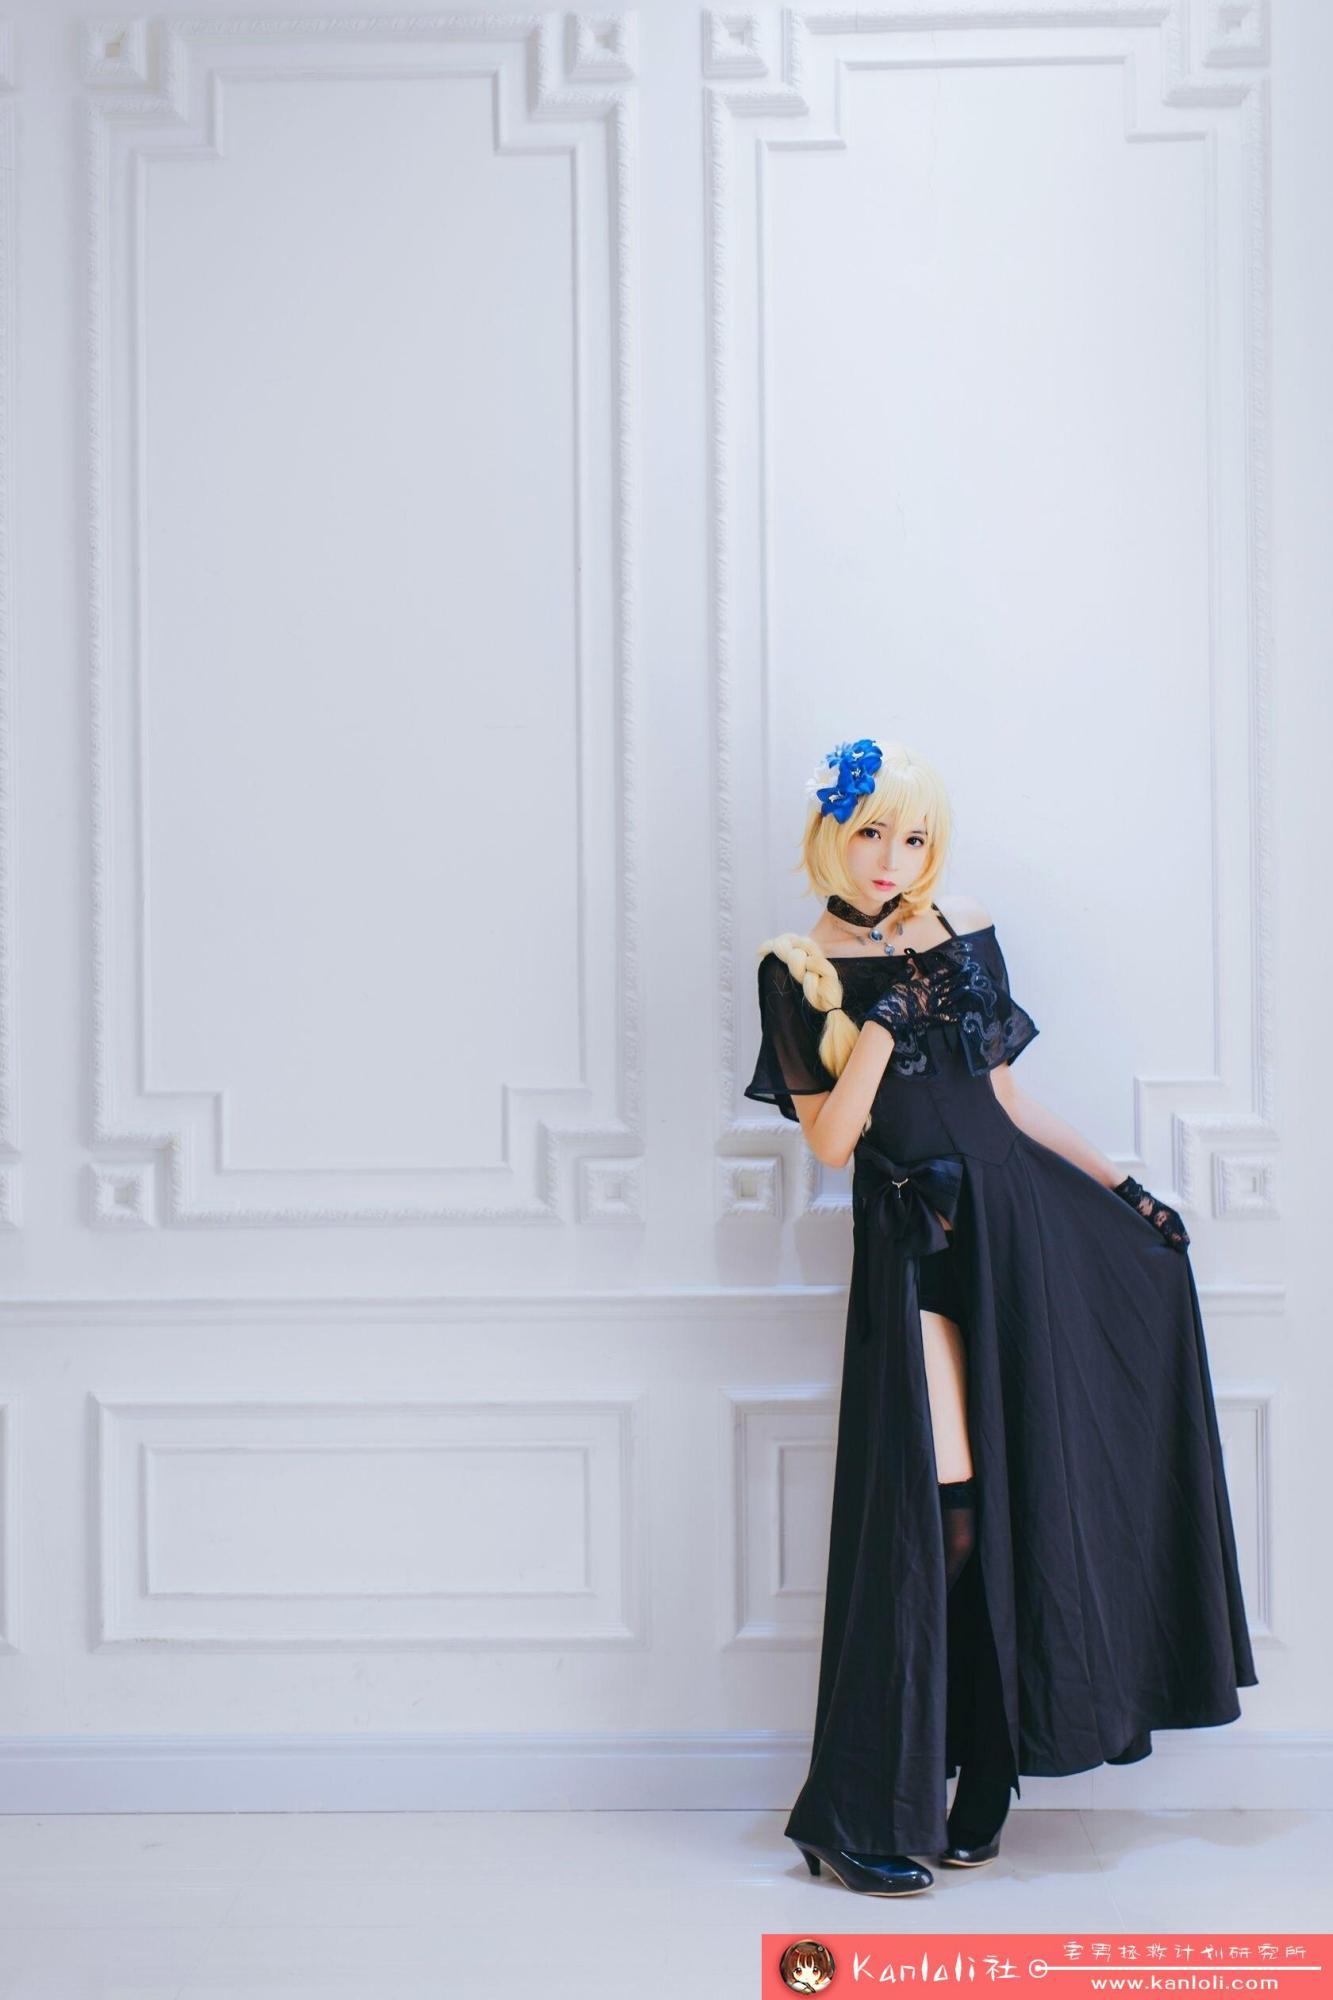 【疯猫ss】疯猫ss写真-FM-017 公主范cosplay [12P]